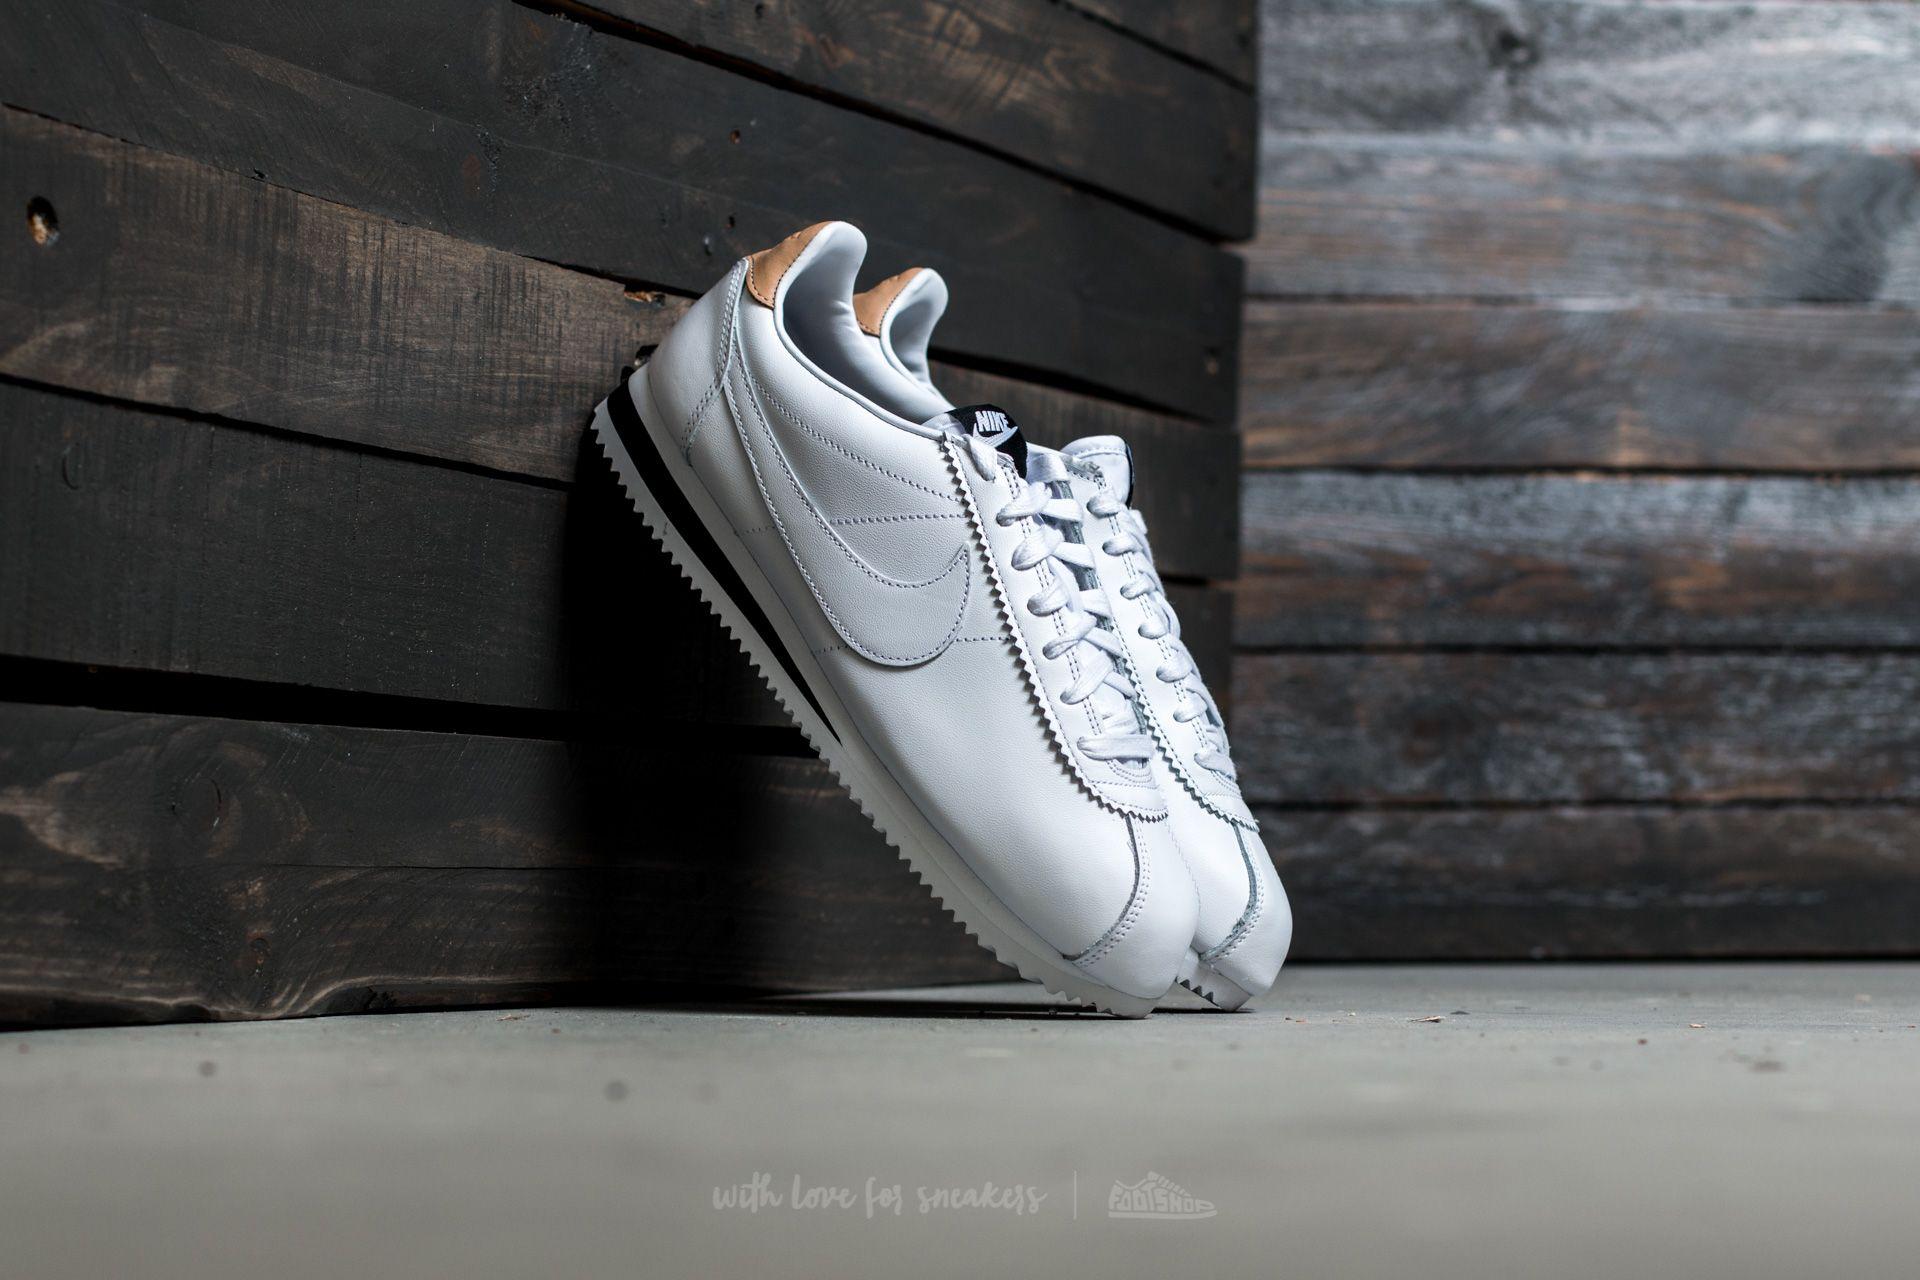 NIKE CORTEZ (WHITEBLACK) | Nike classic cortez leather